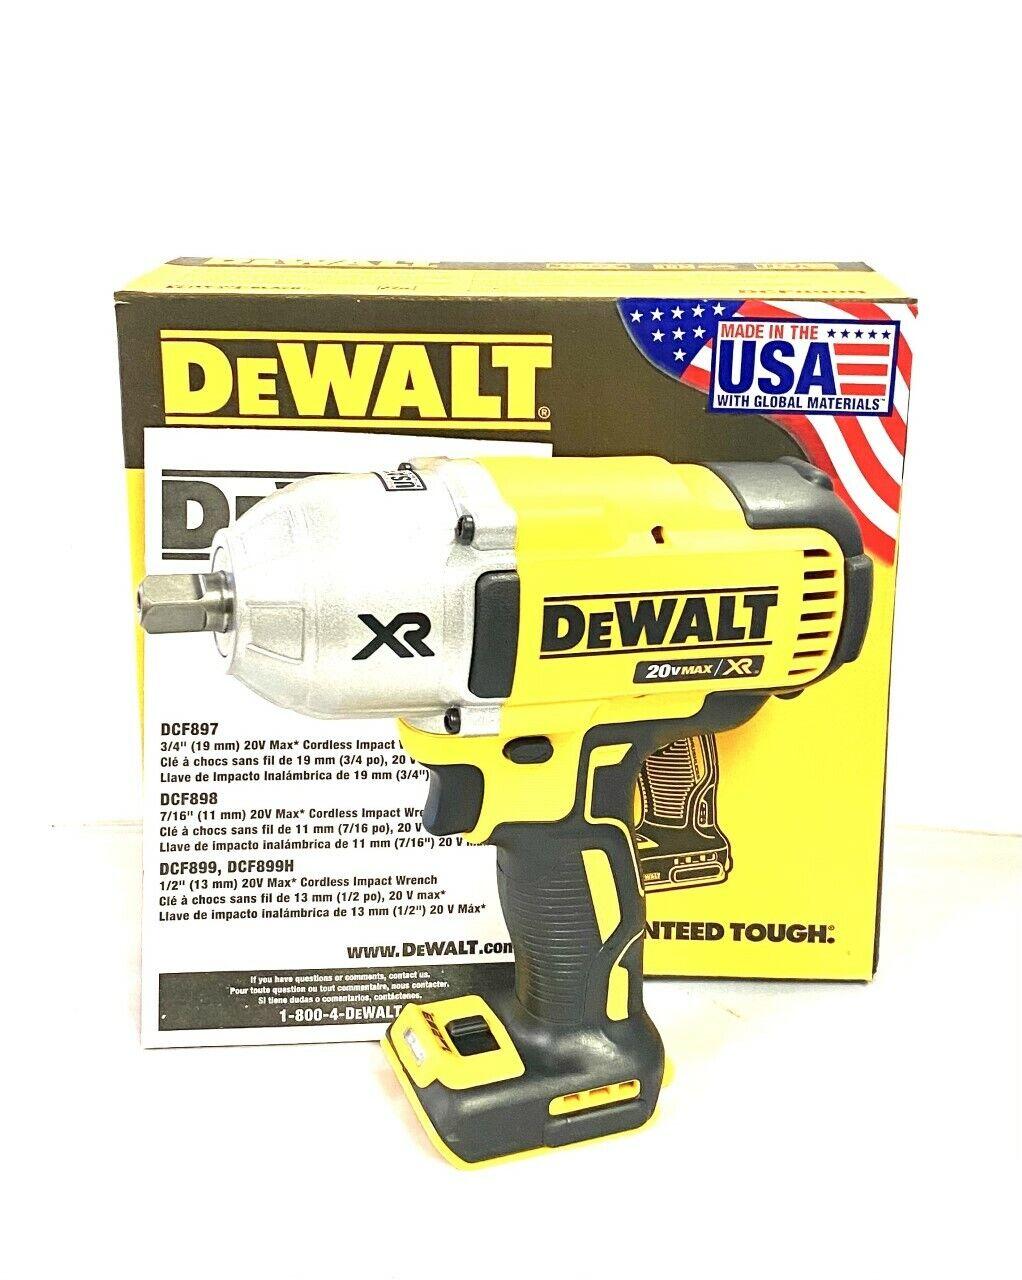 DEWALT 20V MAX Li-Ion 1/2 in. Detent Pin Impact Wrench DCF899B New (BT)